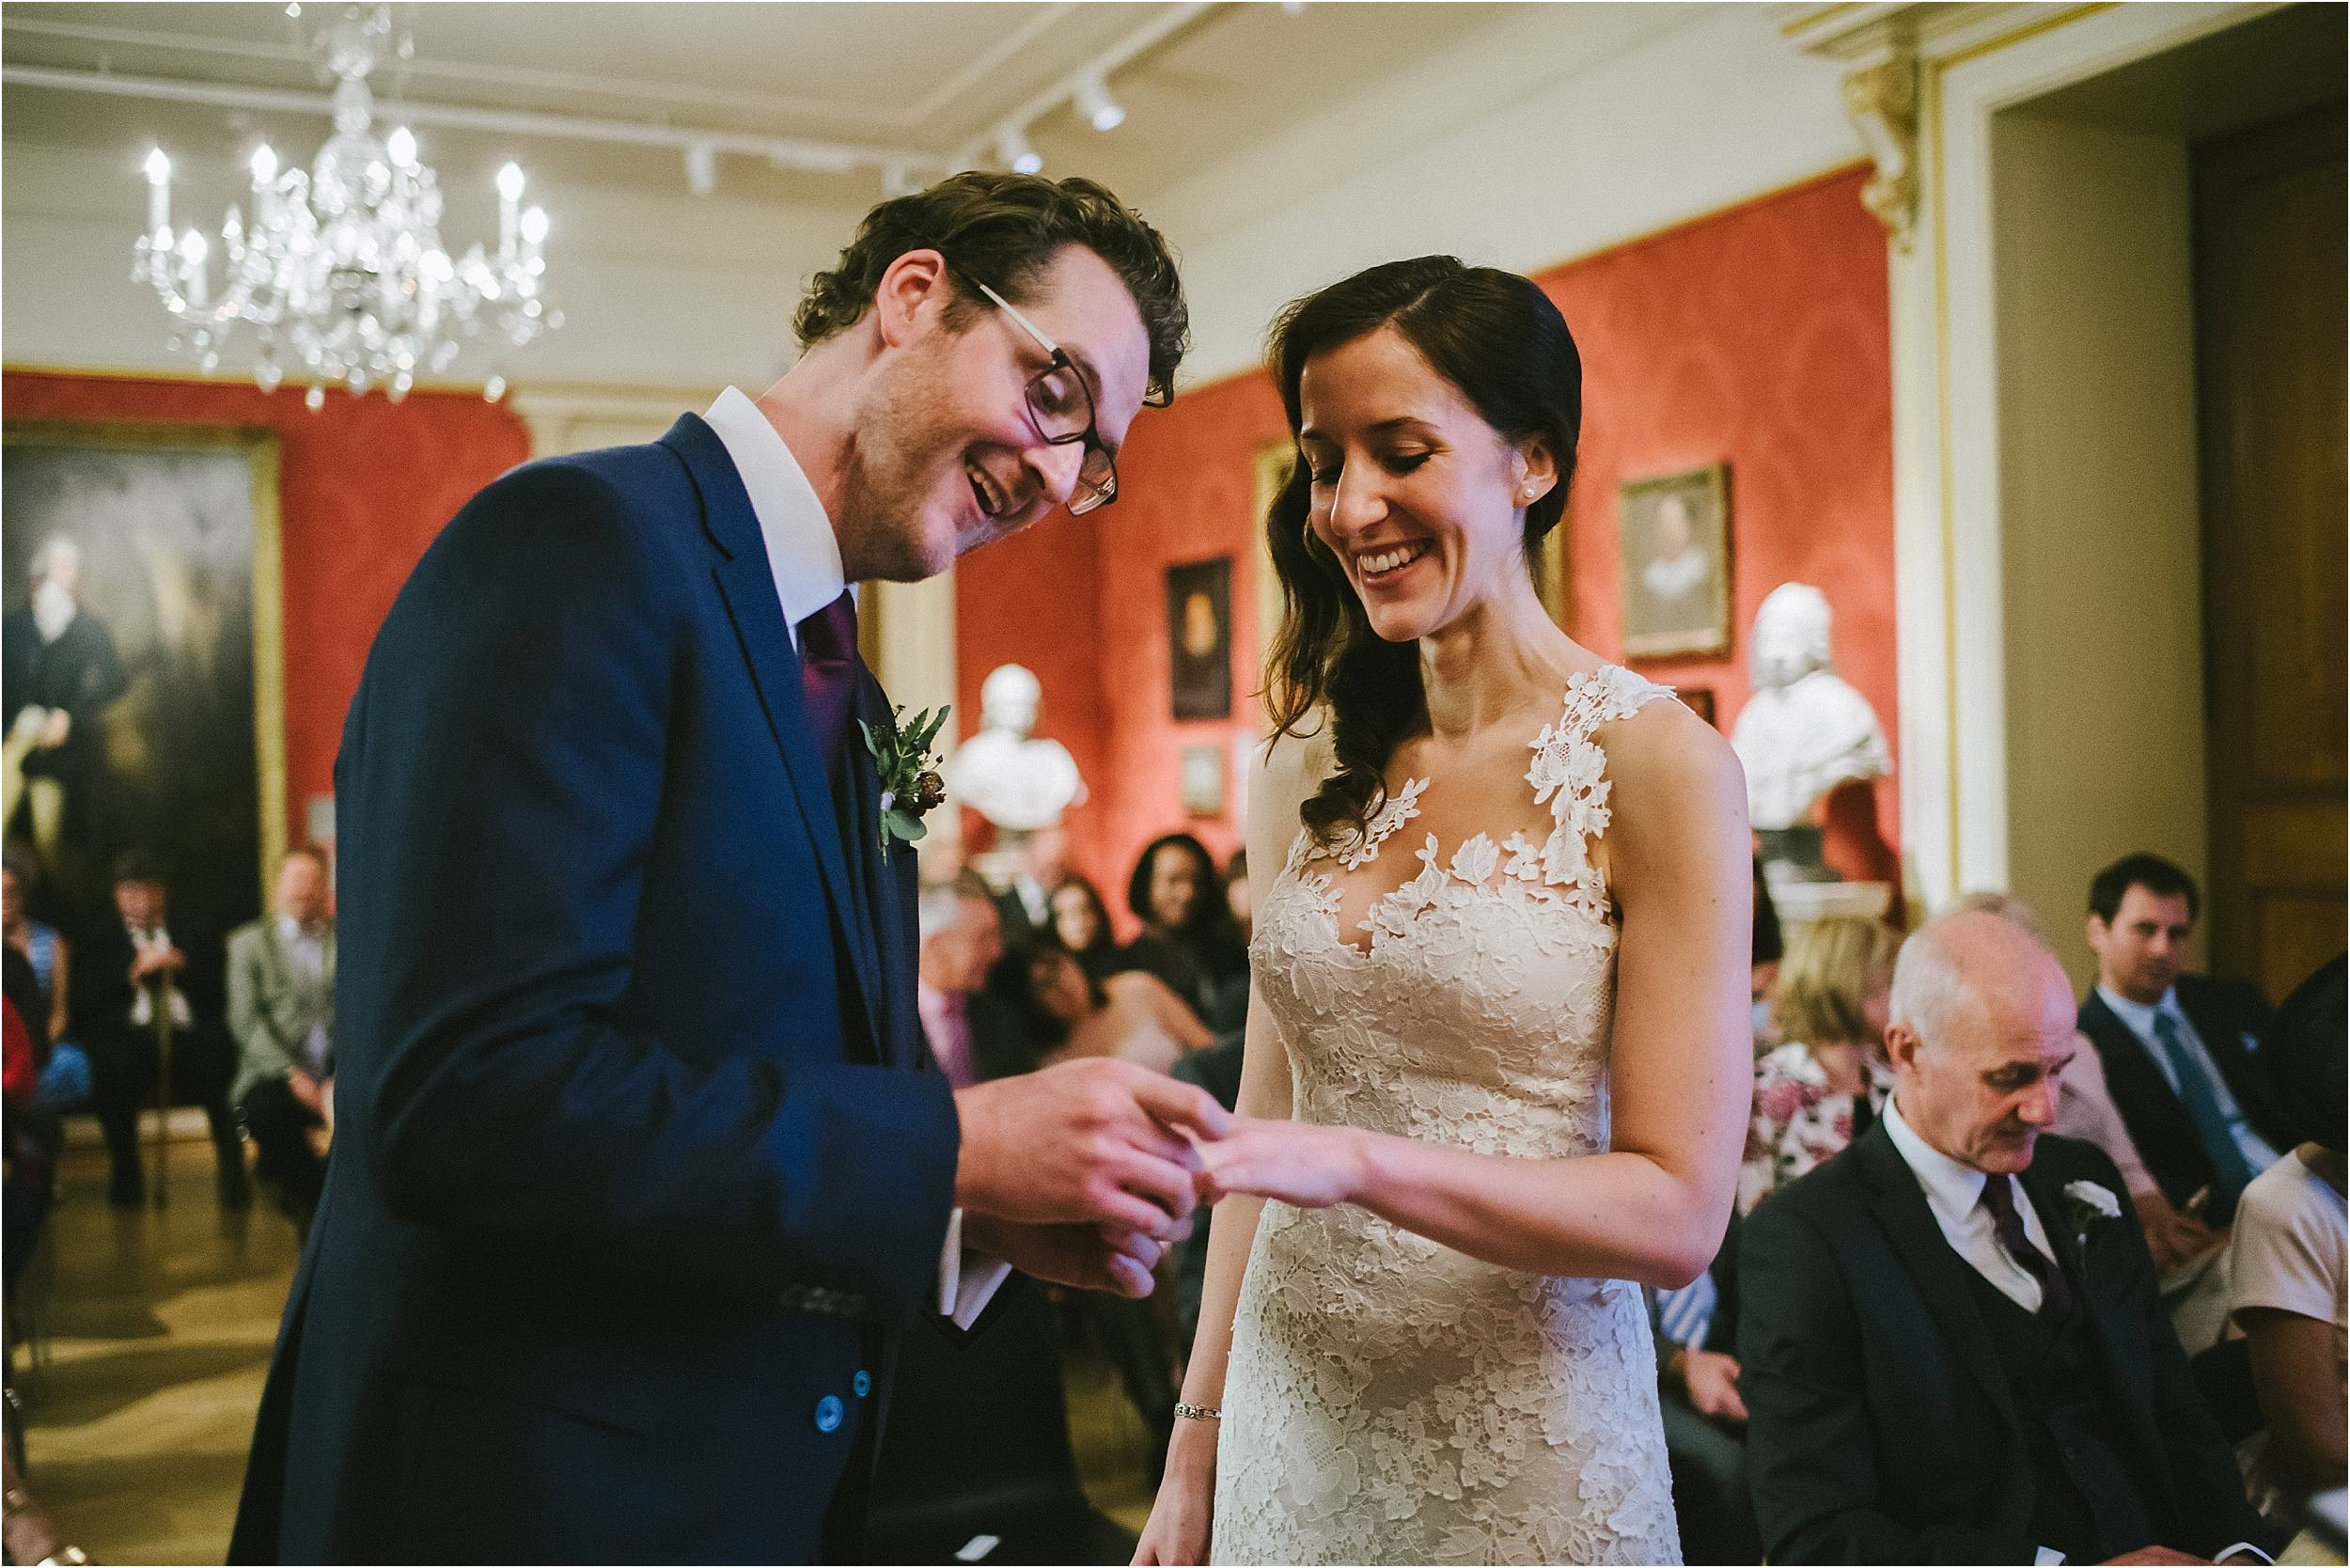 Oxford Ashmolean Museum Wedding Photography_0090.jpg